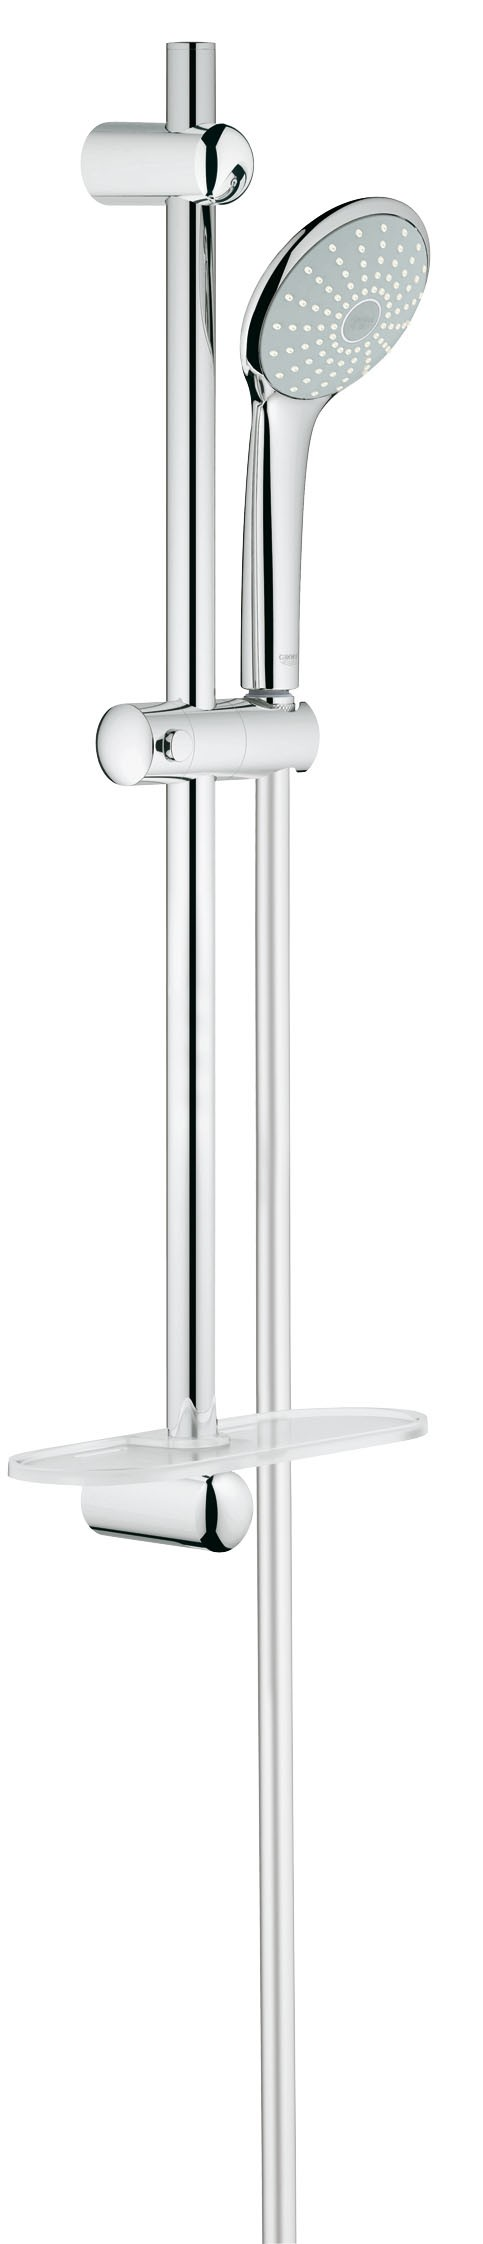 Душевой гарнитур Grohe 27266001 Euphoria (ручной душ, штанга 600 мм, шланг 1750 мм), хром